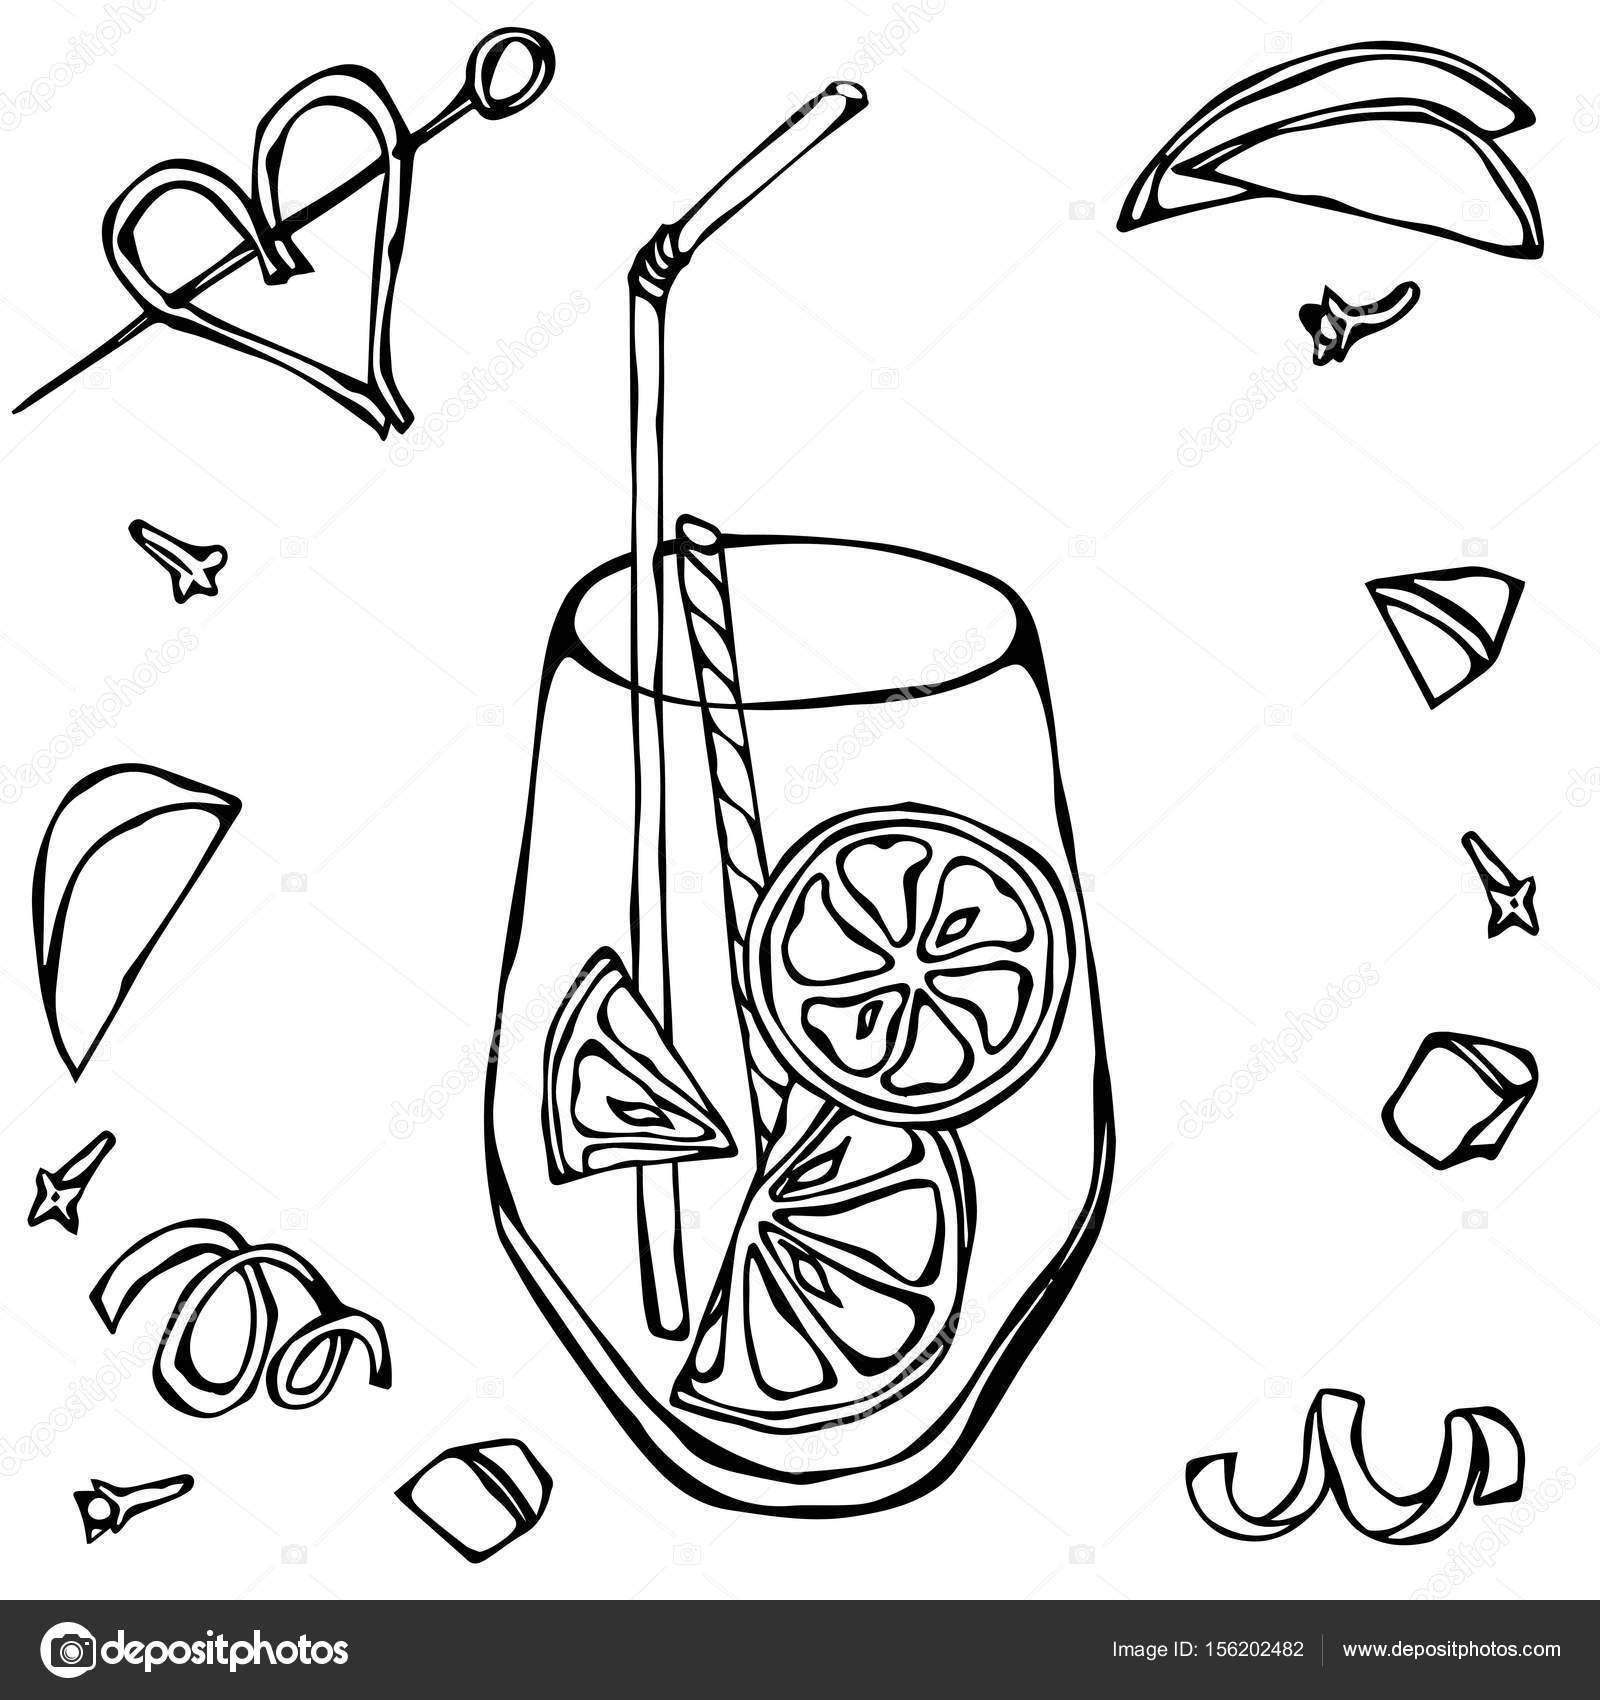 1600x1700 Glass Of Lemonade With Lemon Slice And Cocktail Tube. Realistic